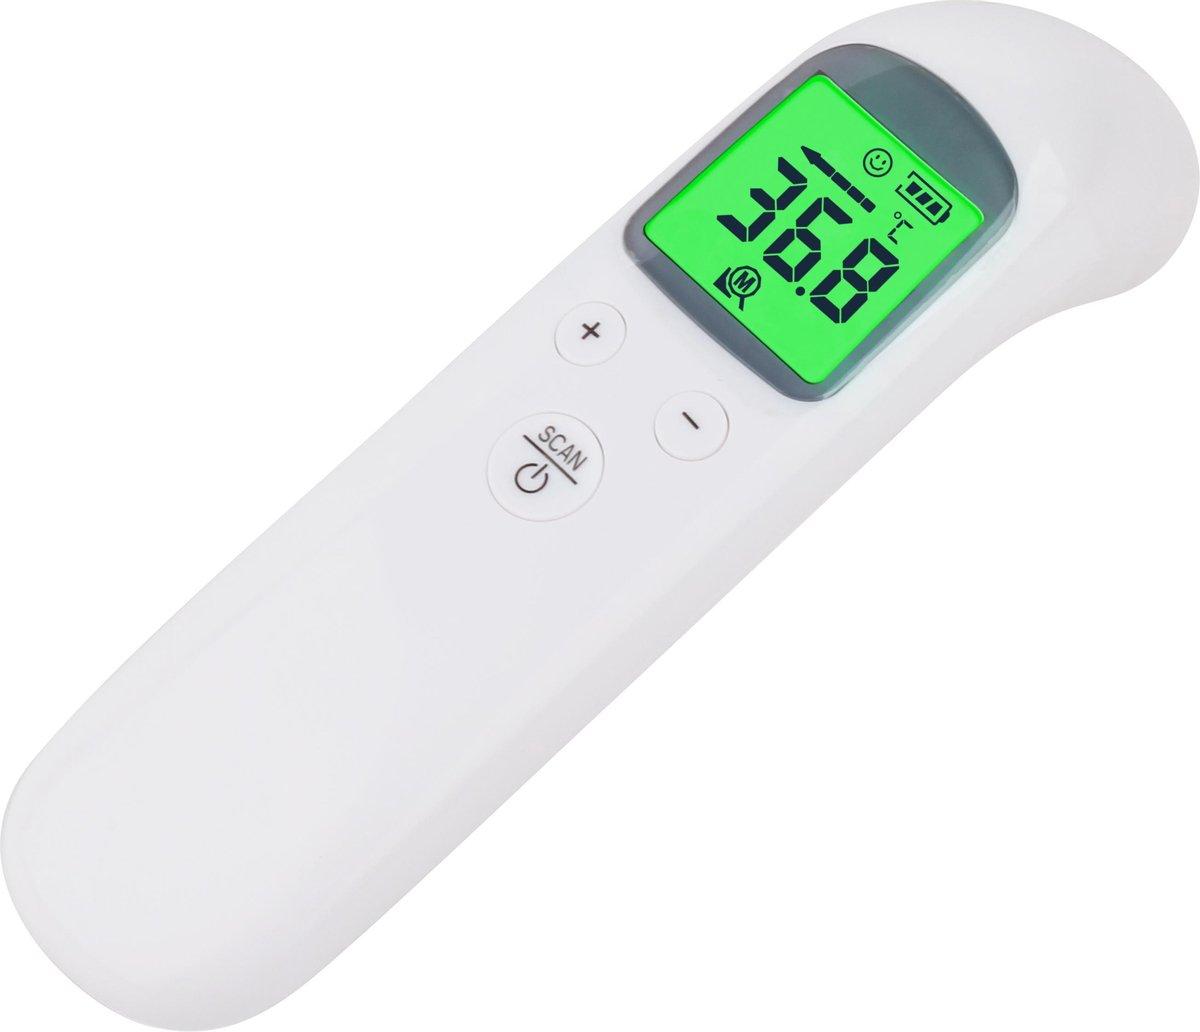 WBTT thermometer